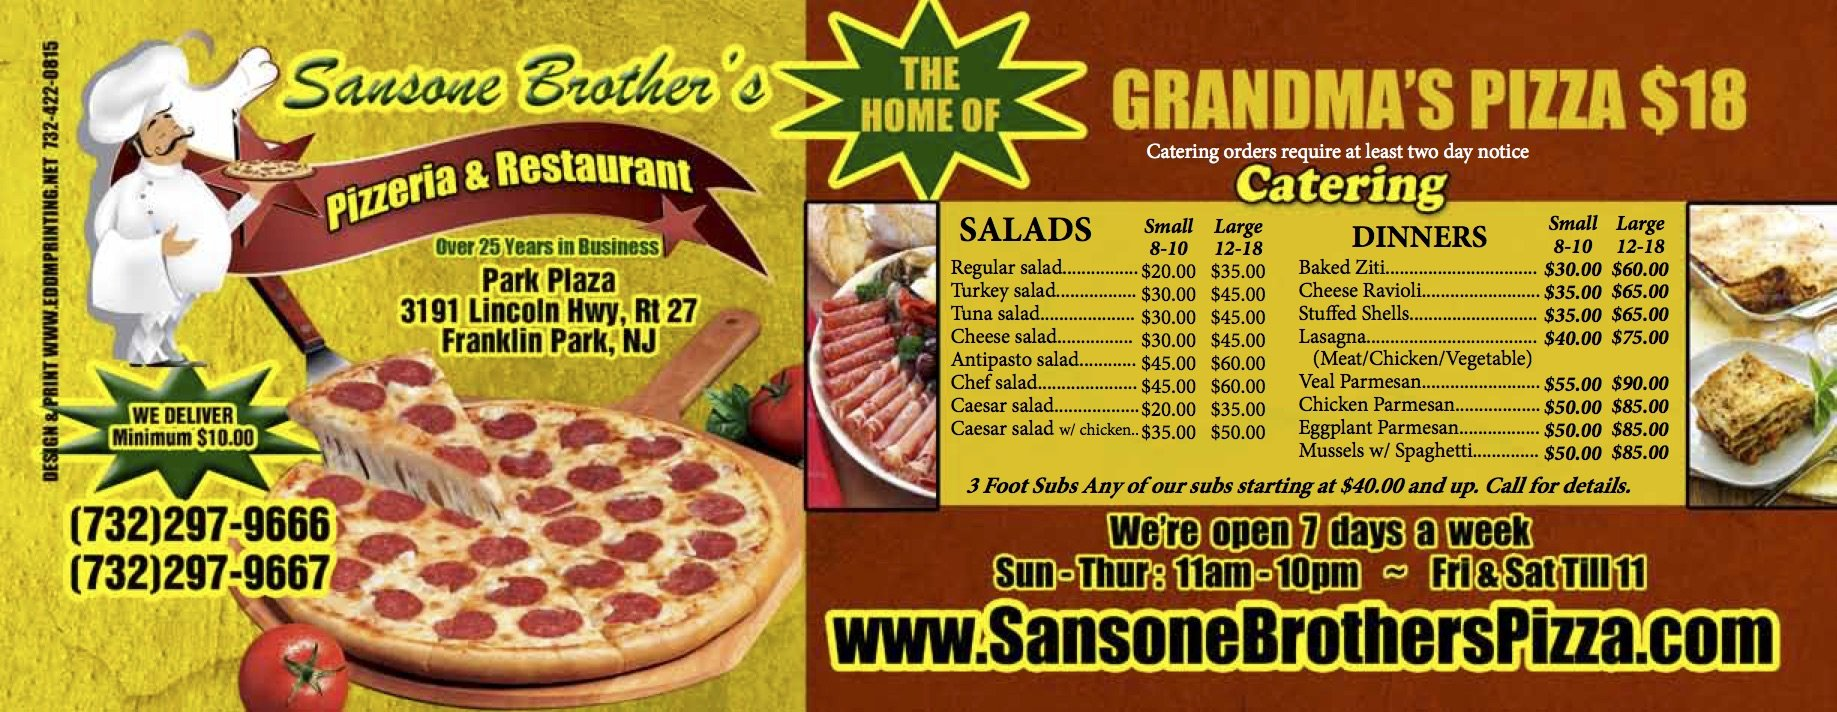 Samson Brother's Pizza